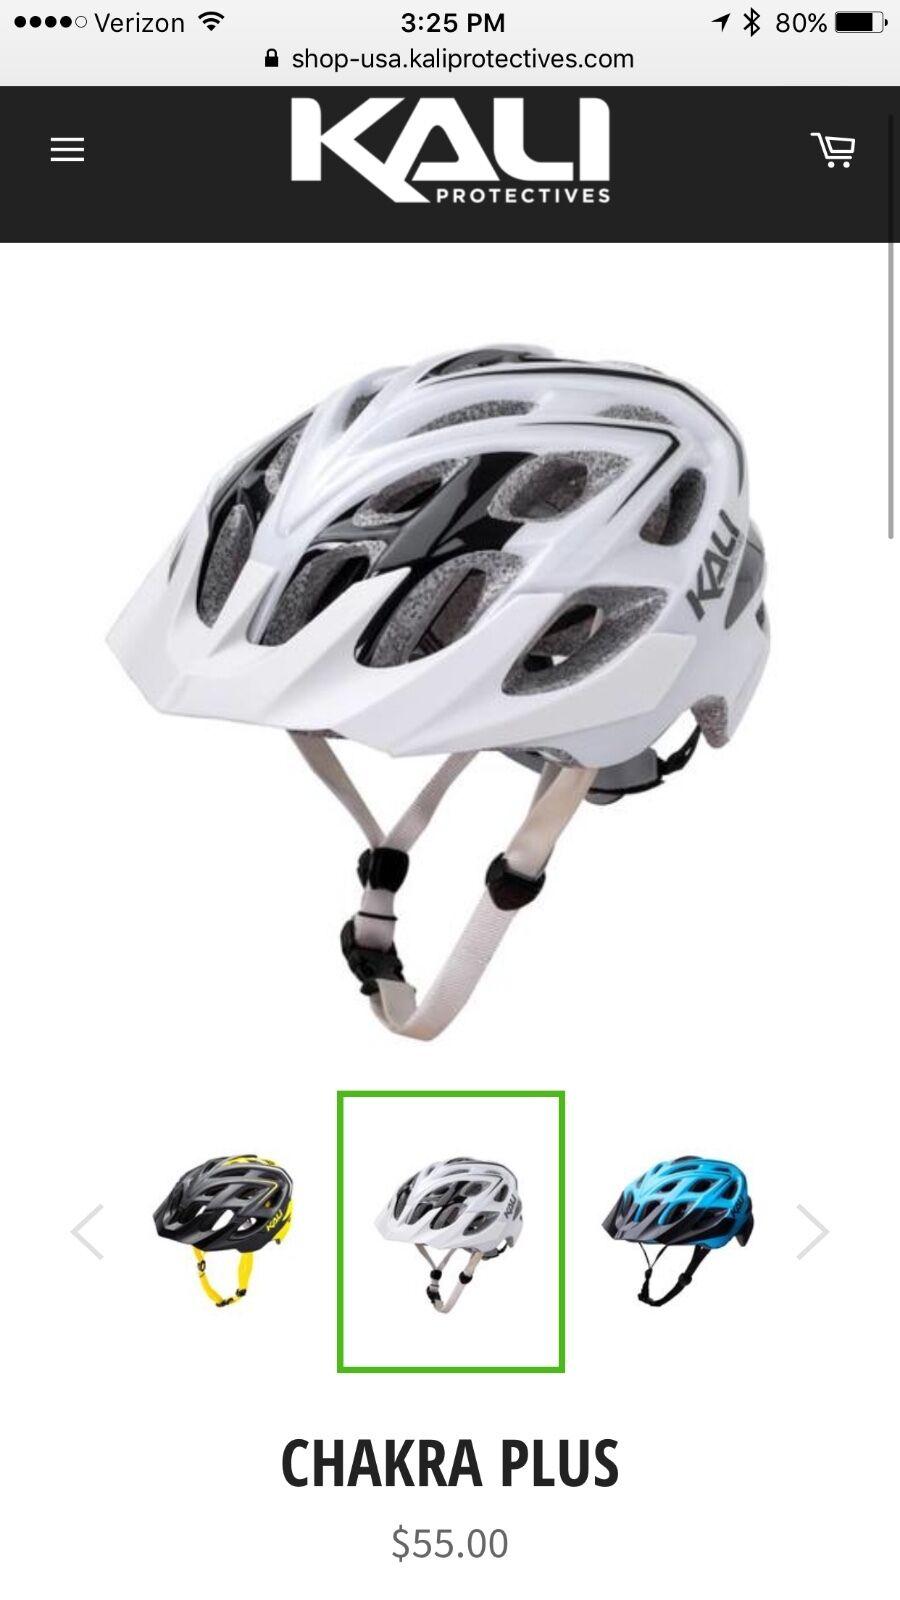 Kali  bike helmet, size s m, brand new in box